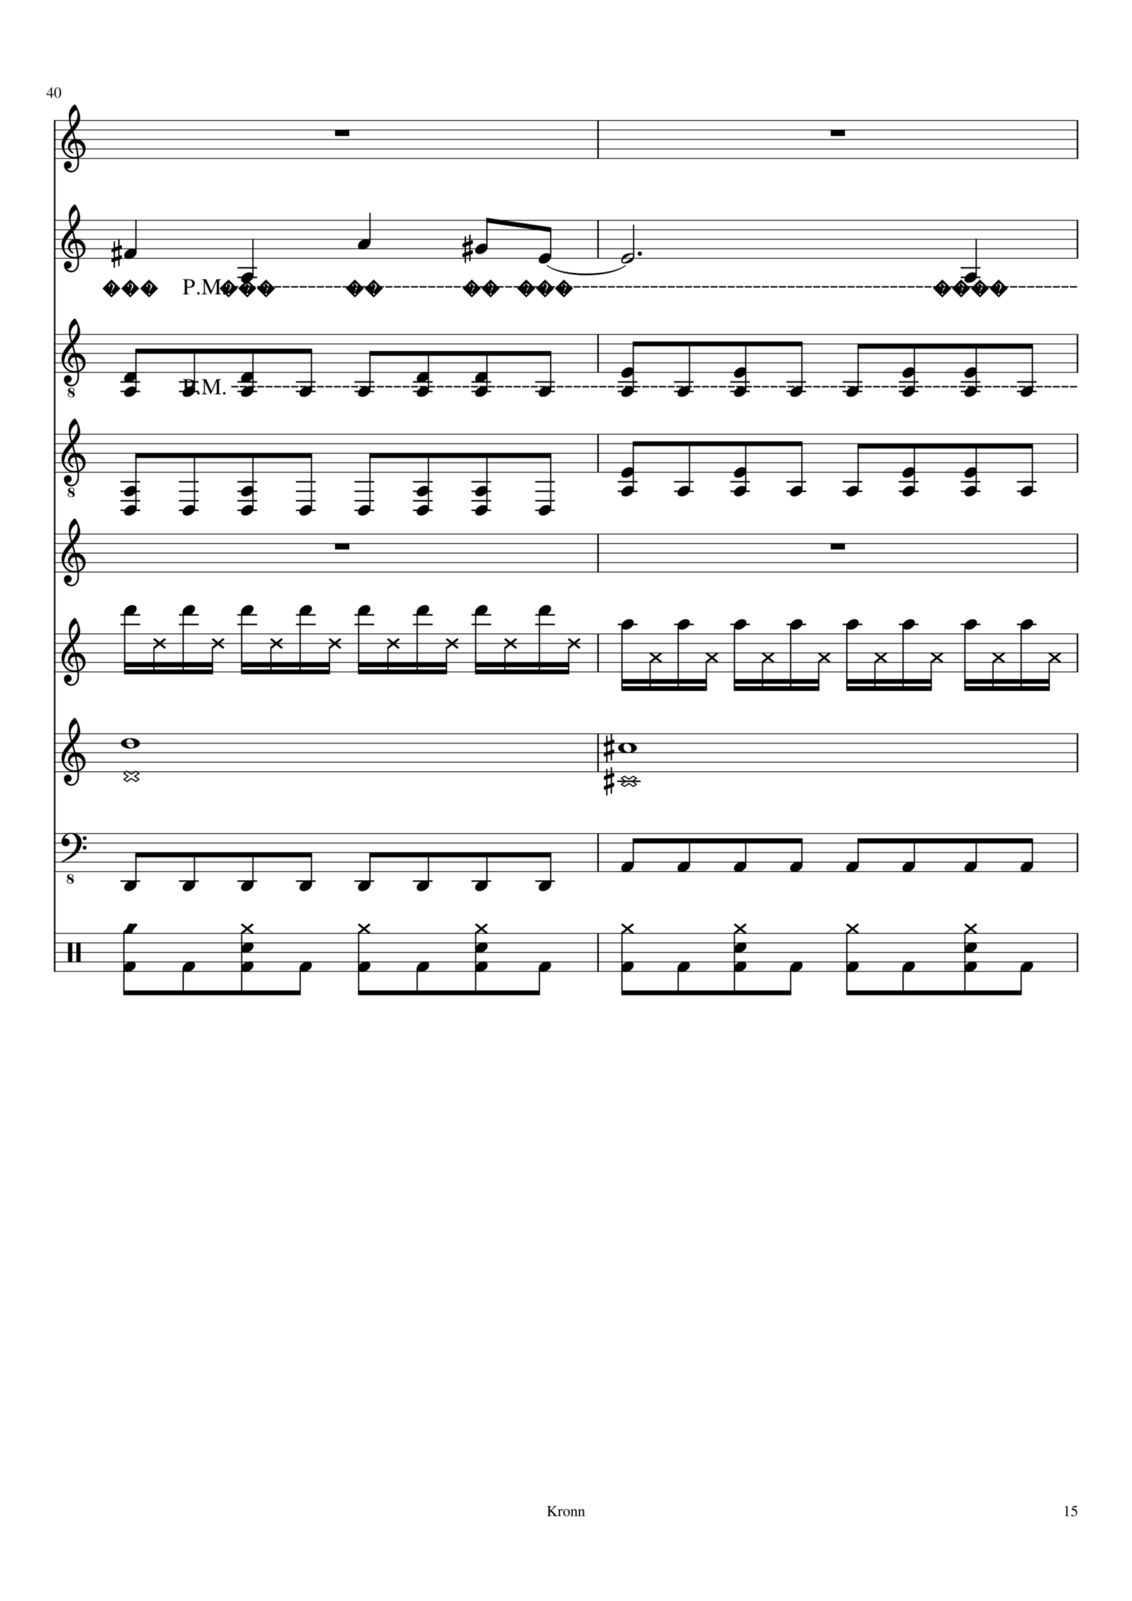 Ispoved Pervogo Boga slide, Image 15